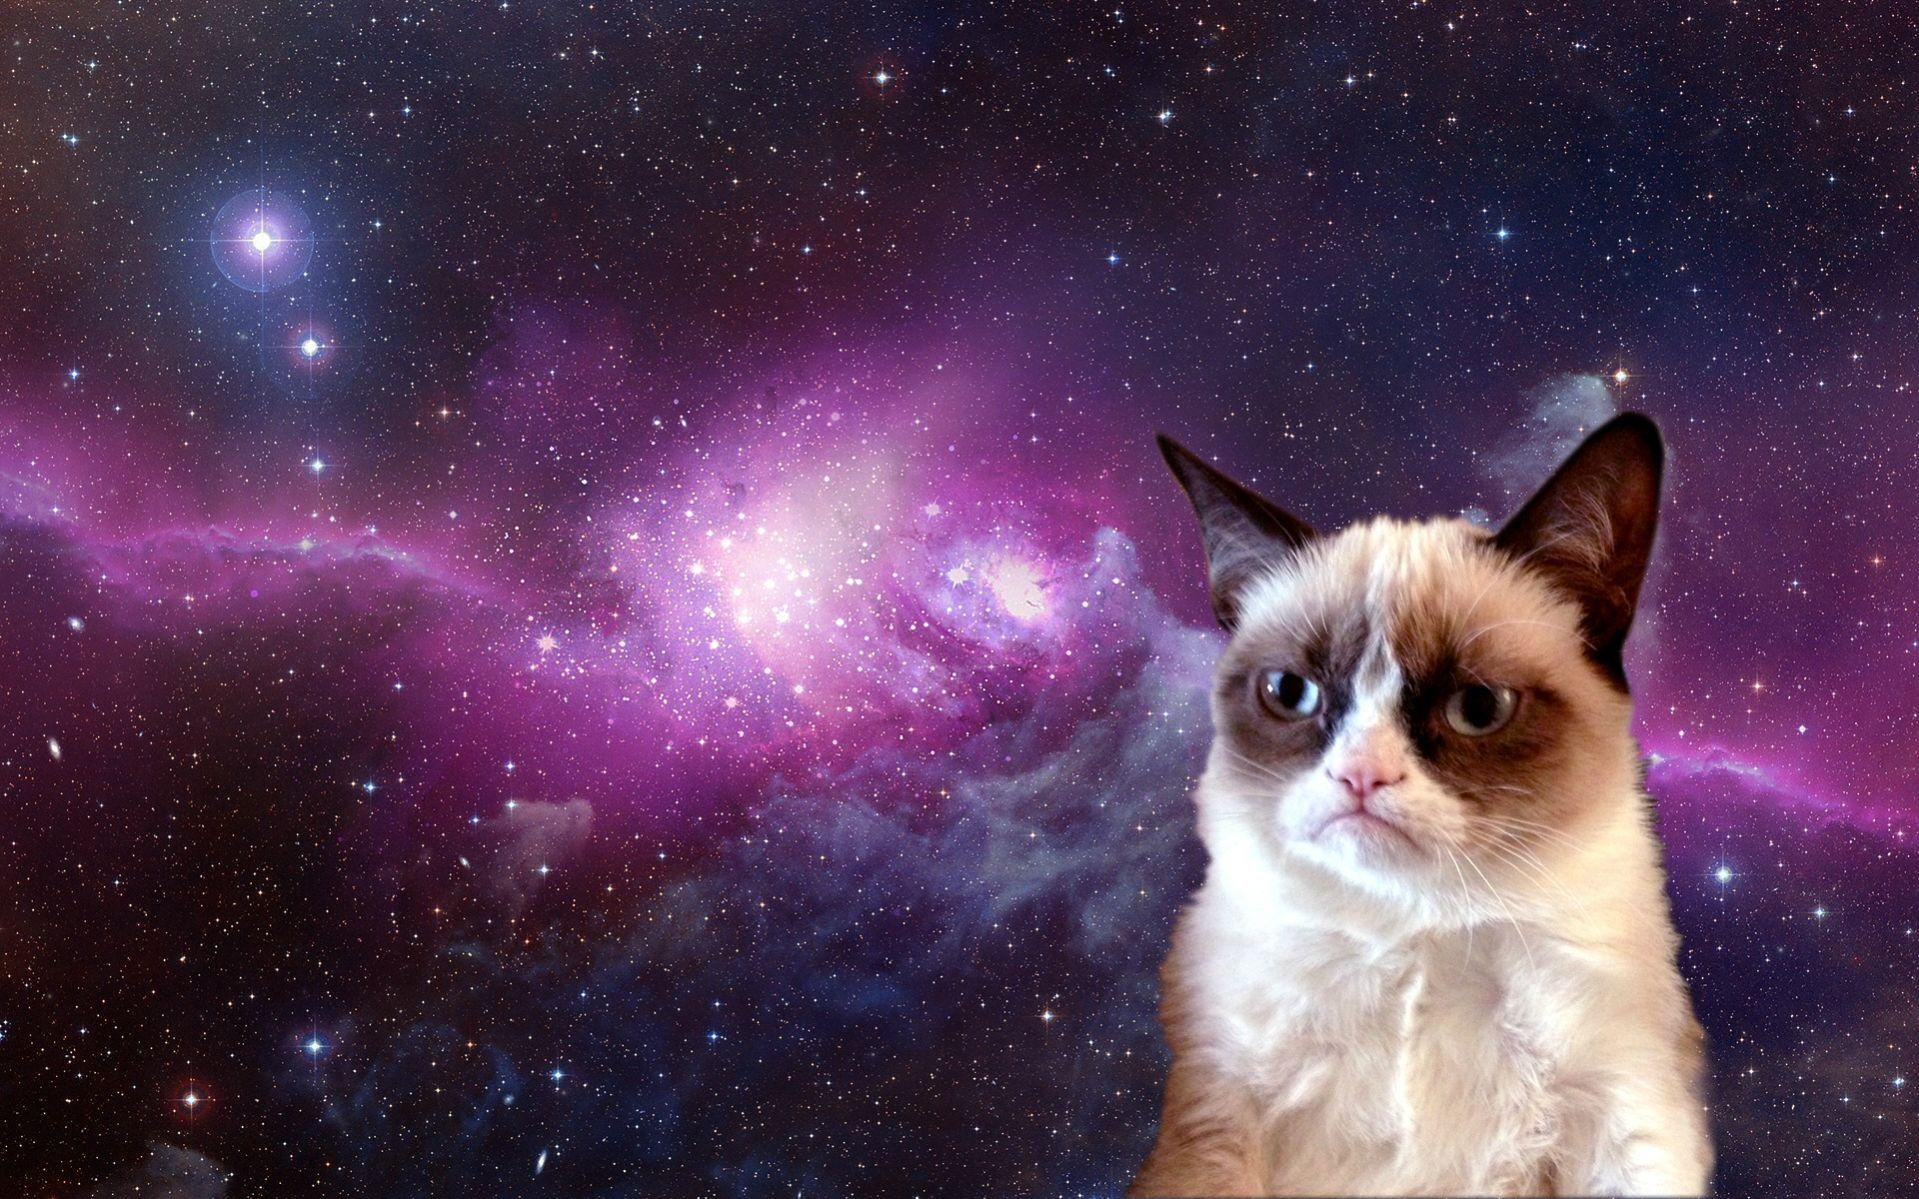 Grumpy Cat in Space HD Wallpaper for Desktop 1919x1199